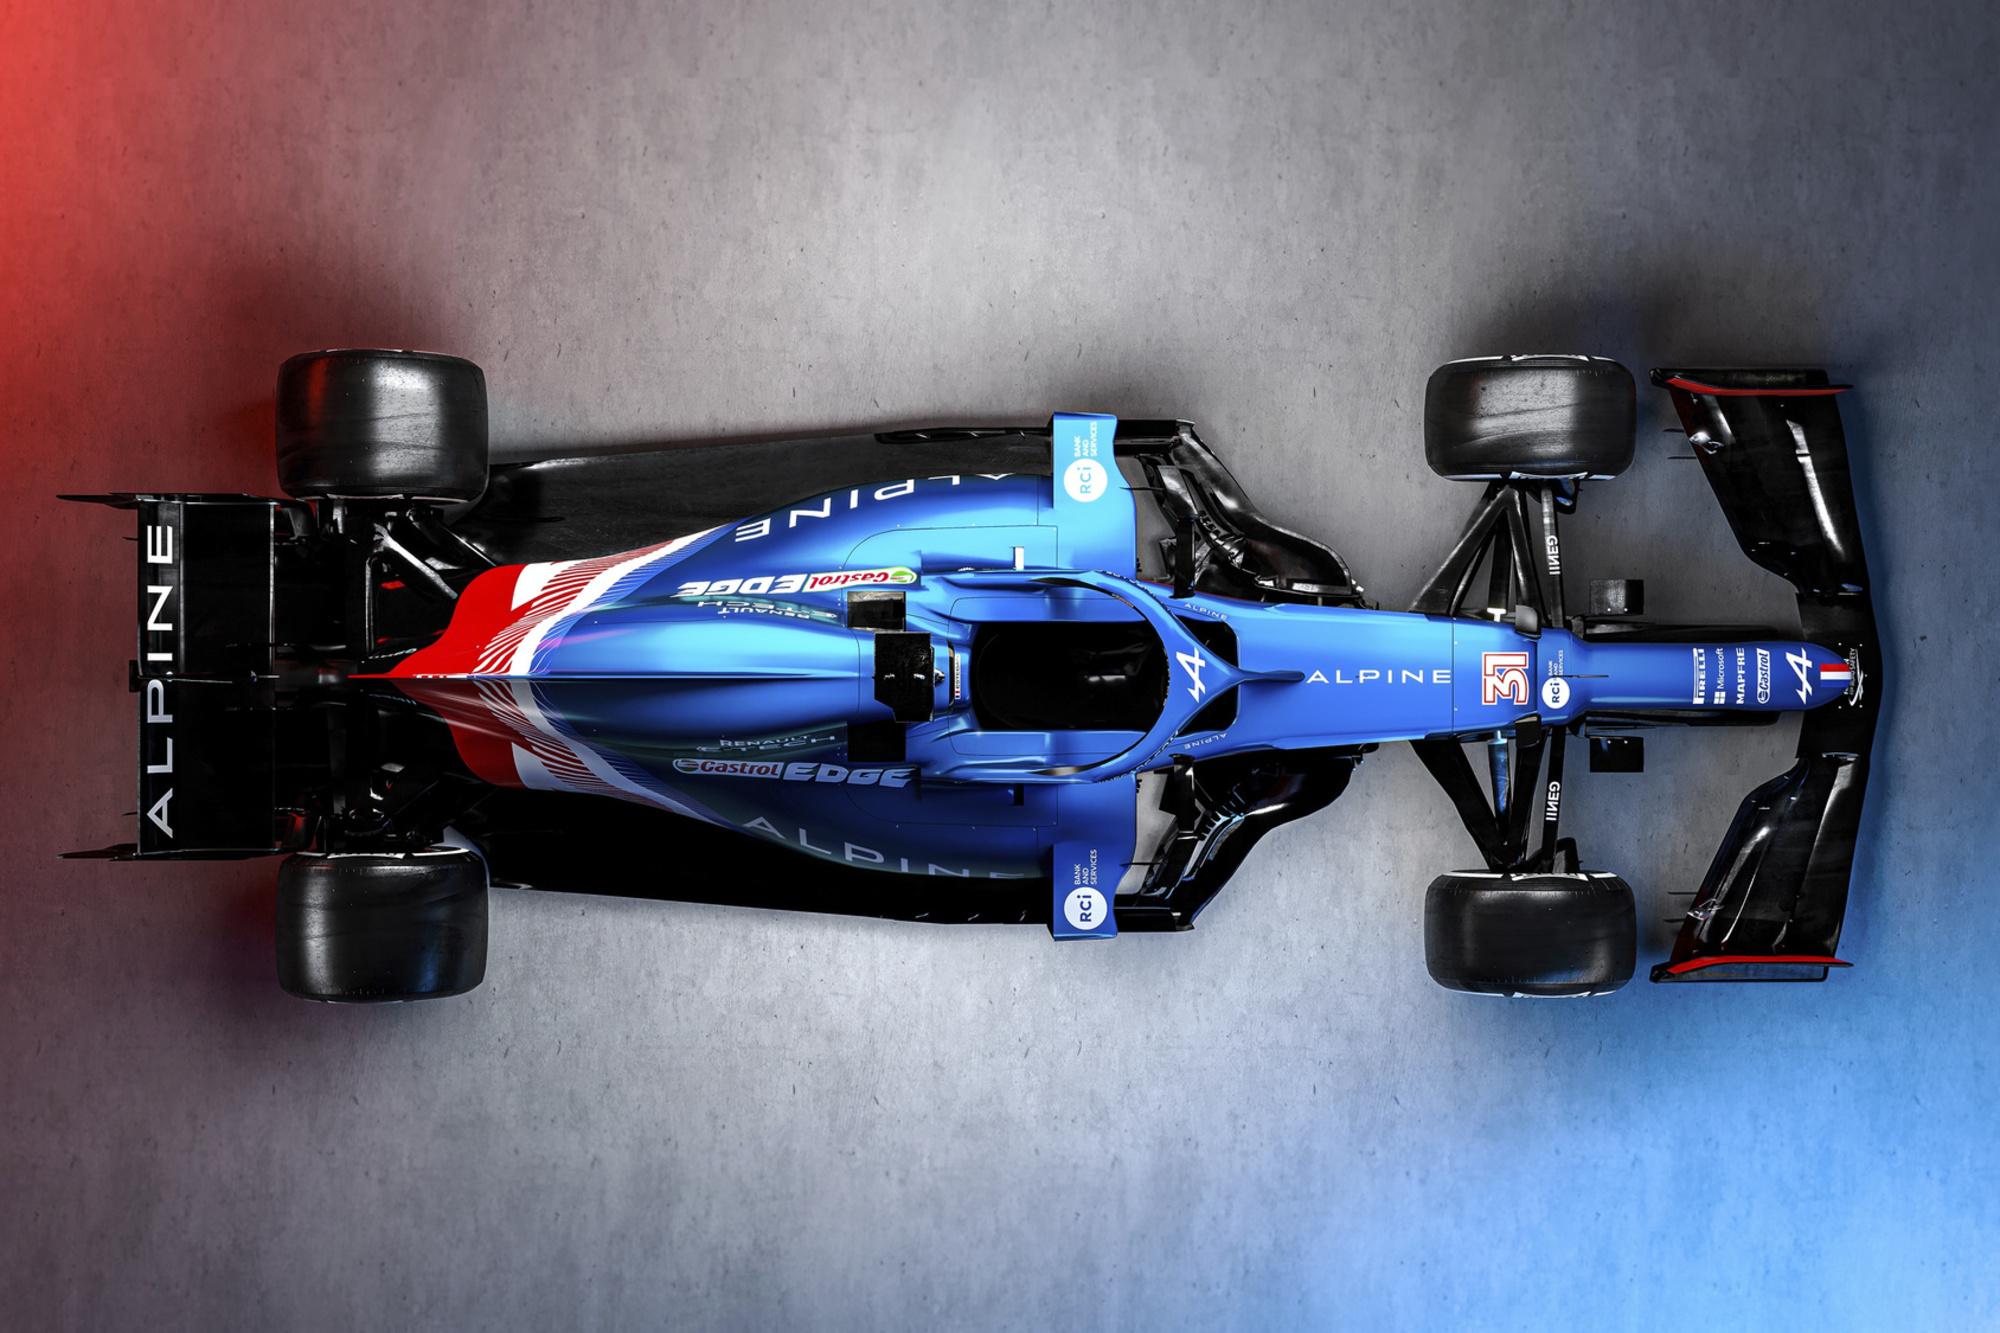 Alpine F1 A521, GF